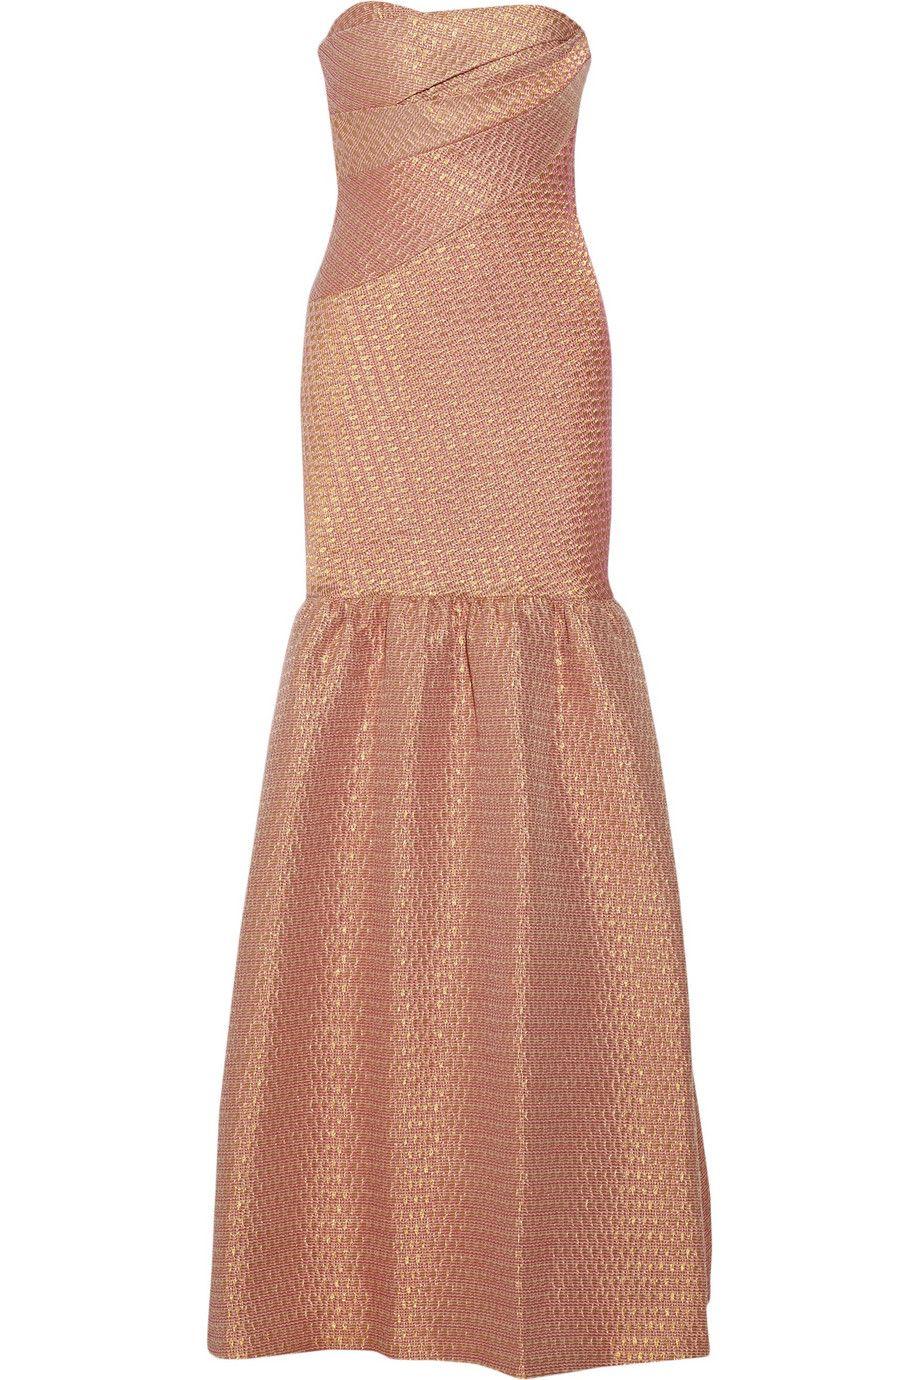 Notte by marchesa metallic brocade gown netaportercom gowns